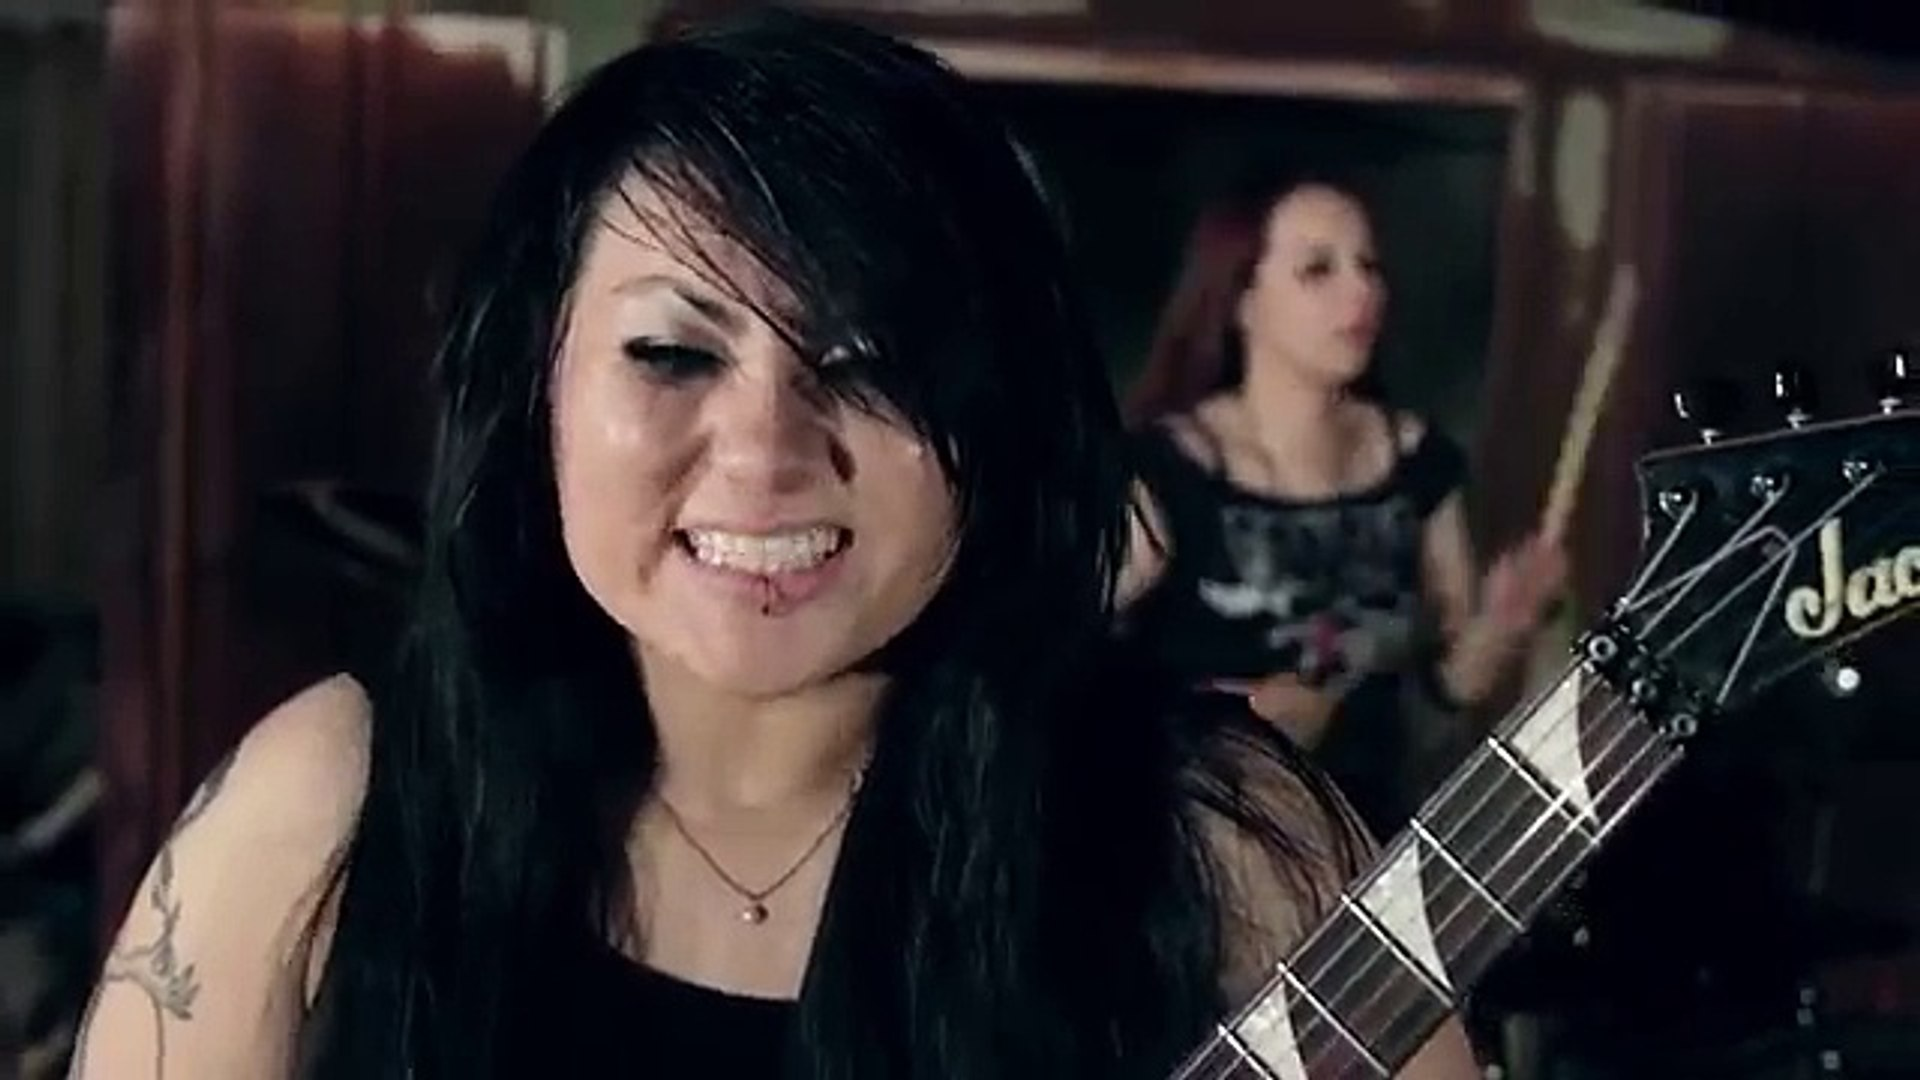 Masochistic Salvation Music Video Teaser